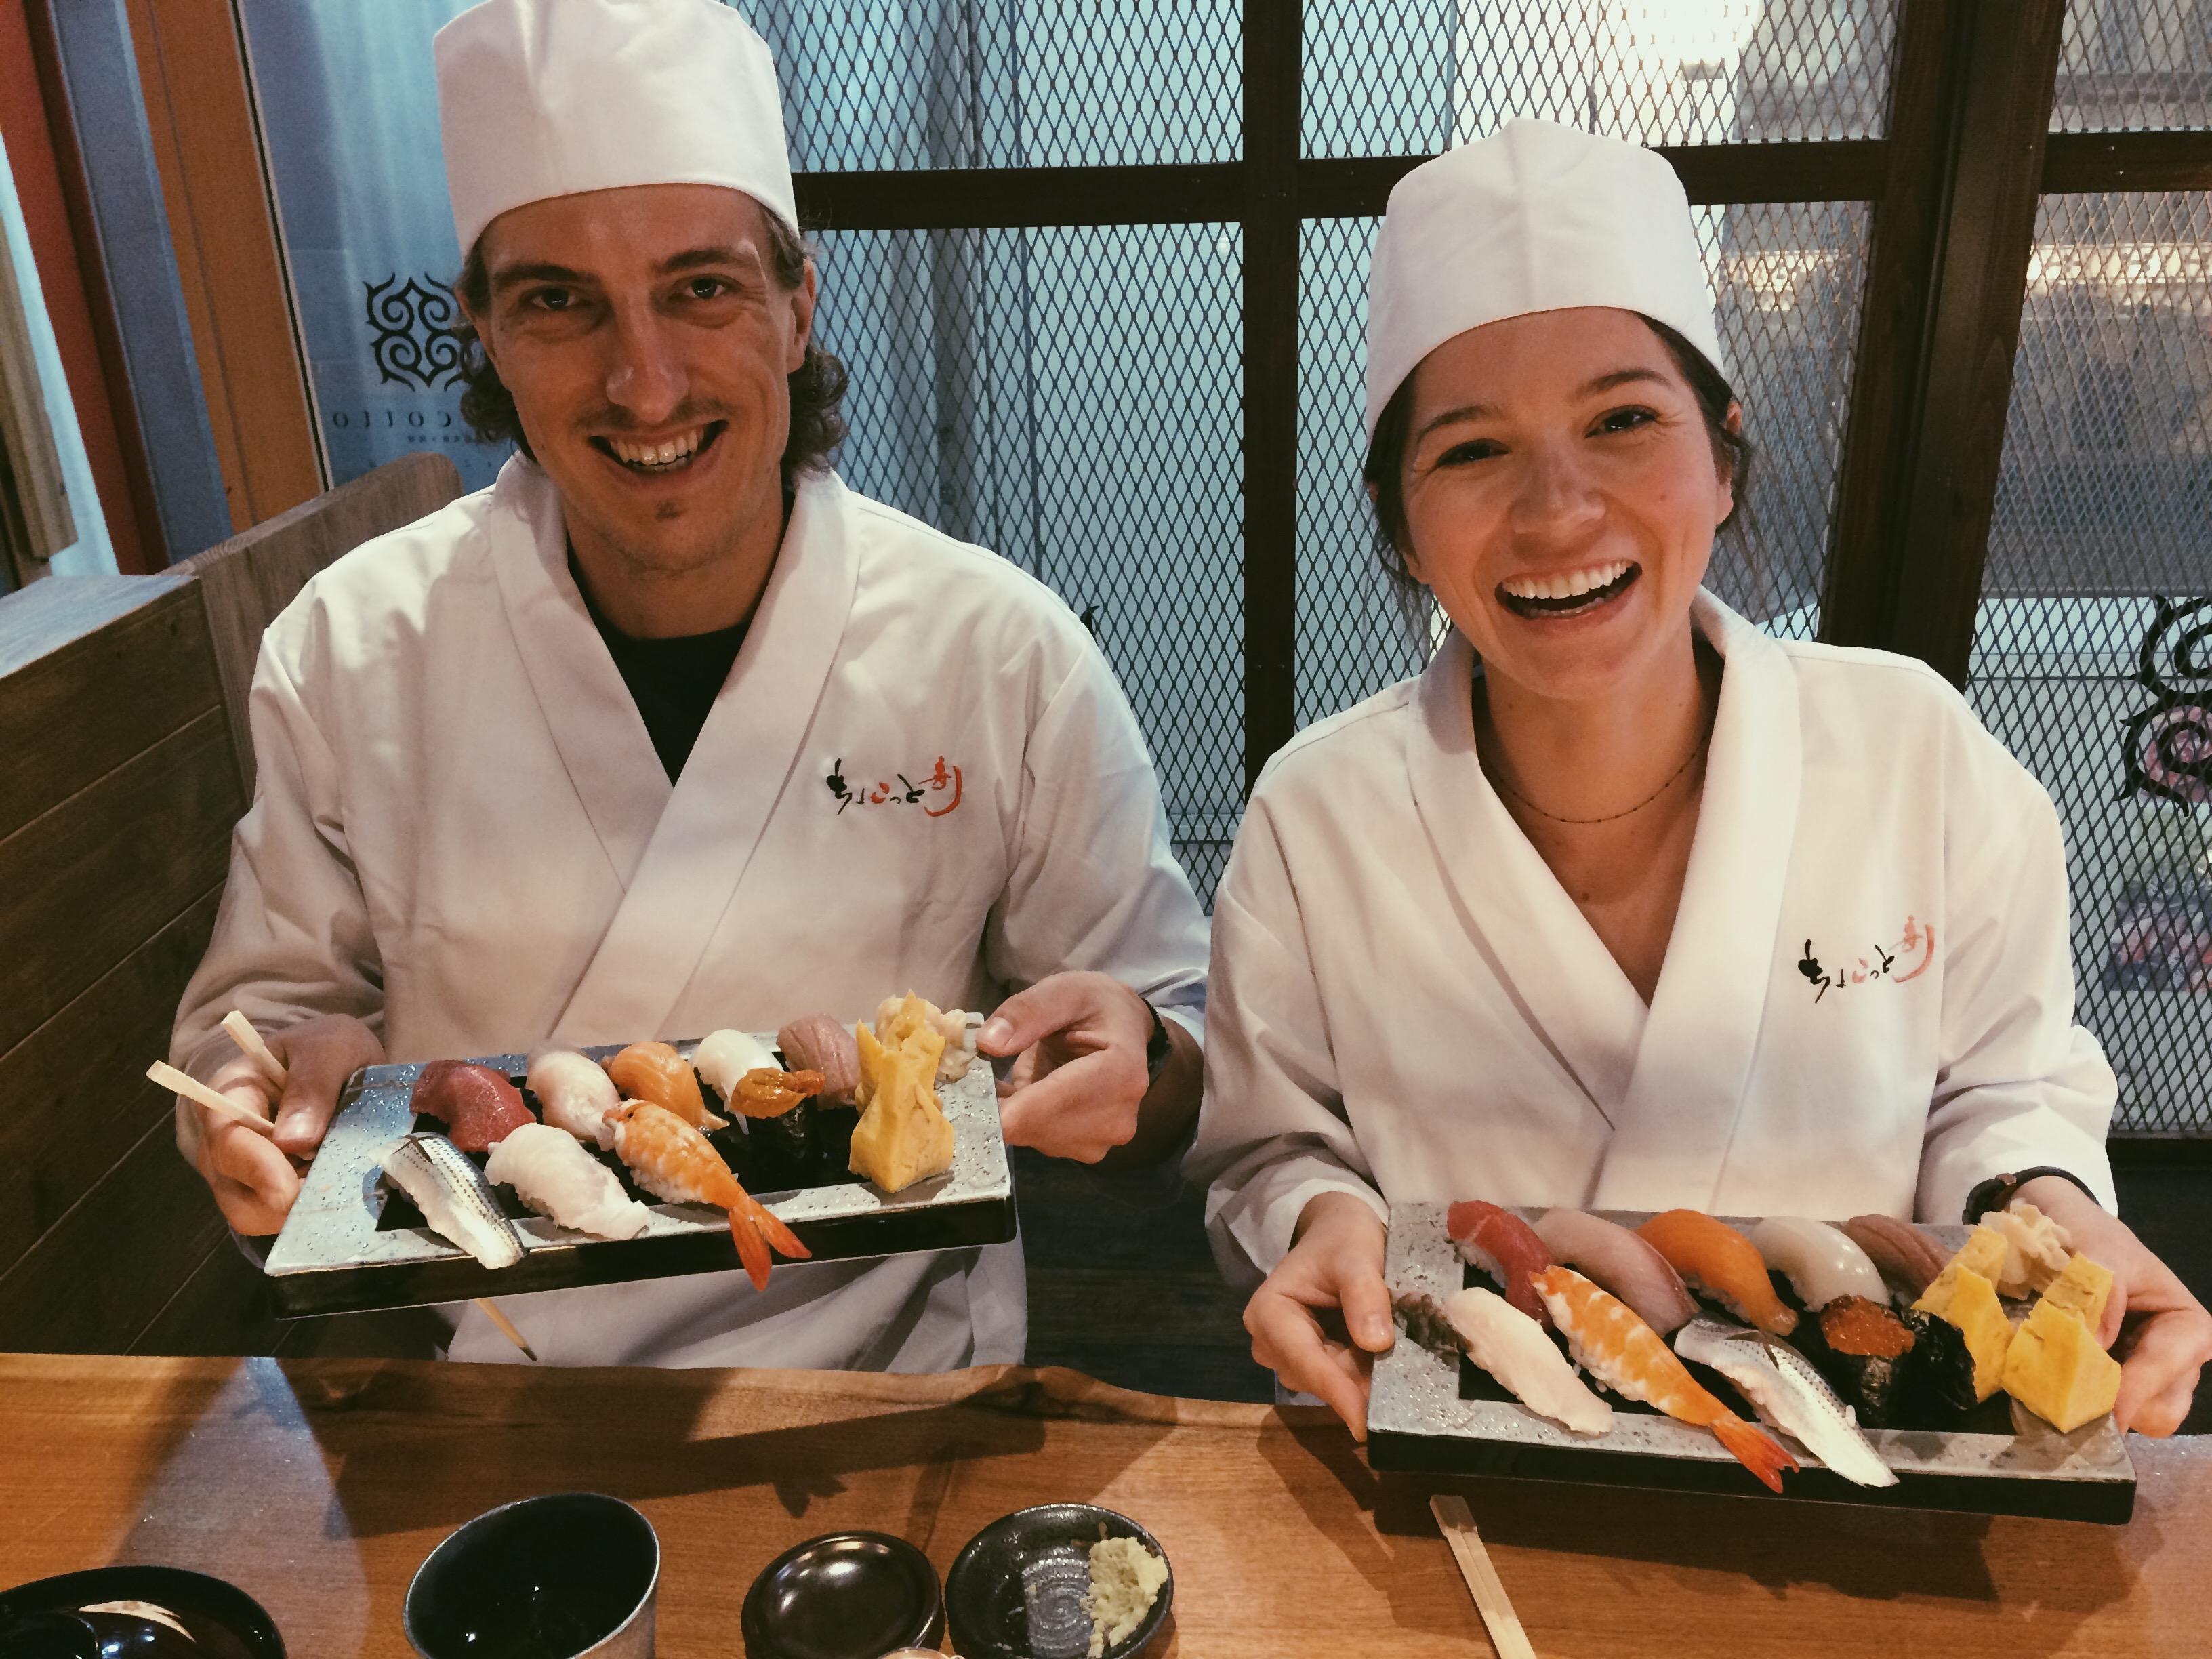 Sushi making class. | Okinawa, Japan